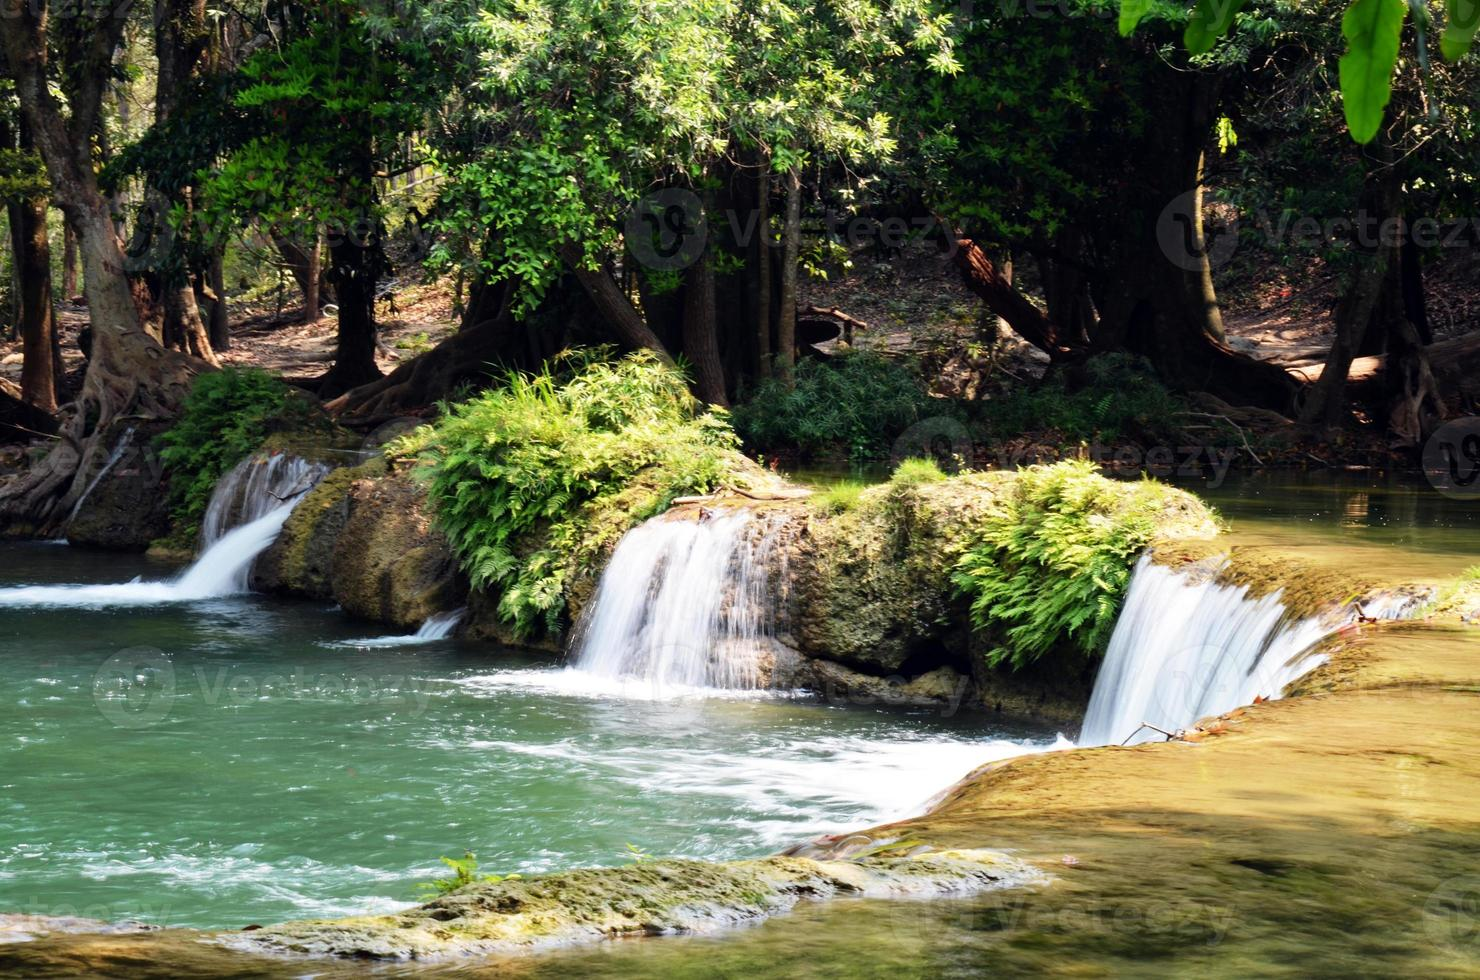 num tok chet sao noi cascata parco nazionale di saraburi foto